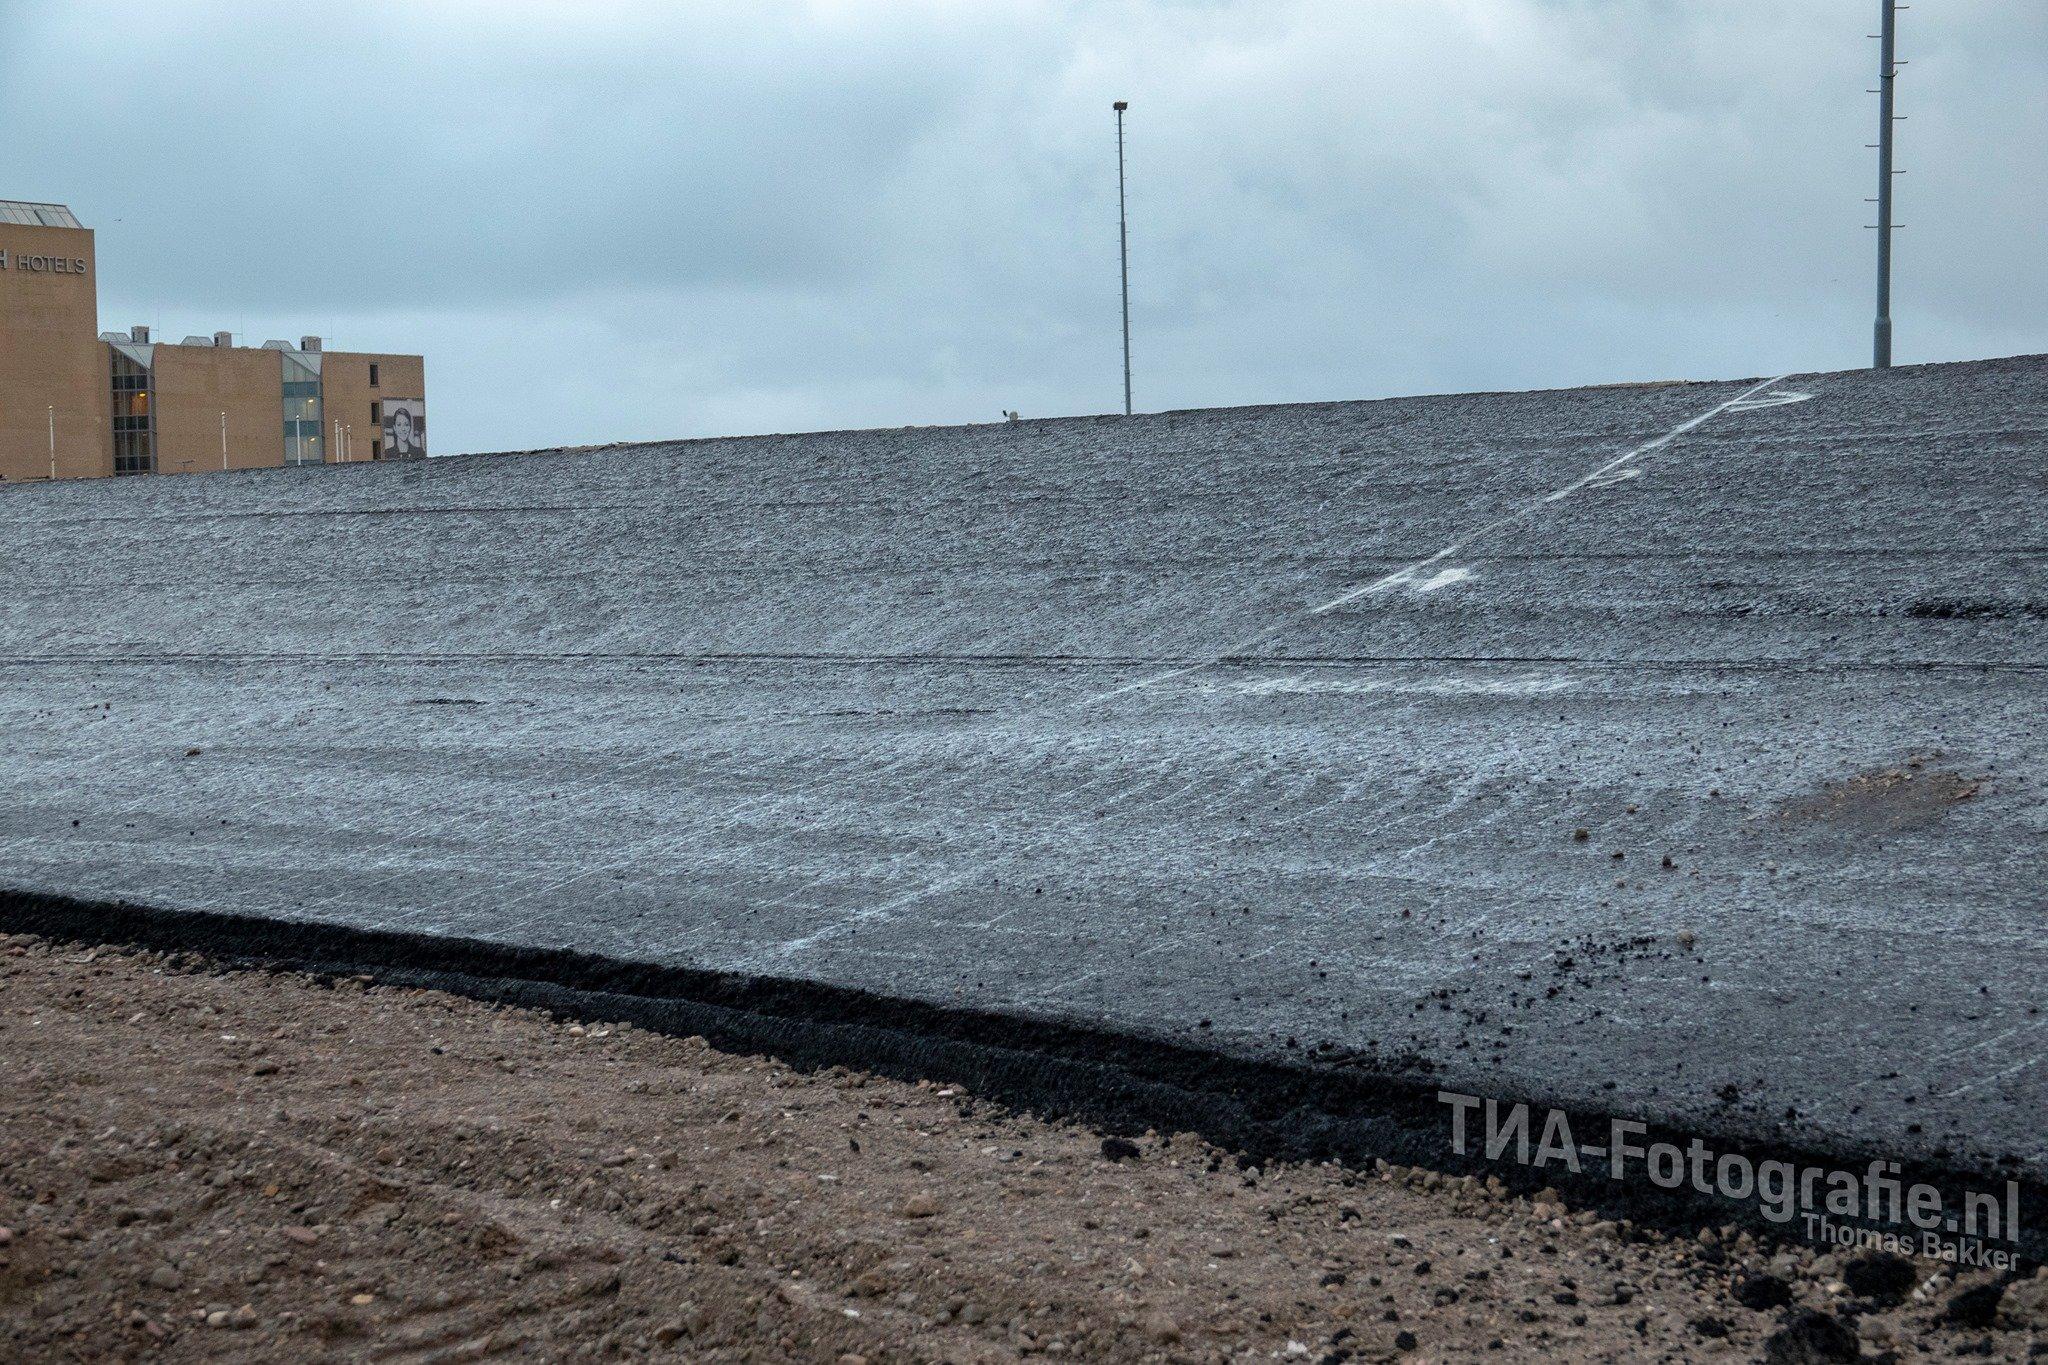 Spy Shot Drone Footage Of Zandvoort F1 Circuit Thejudge13thejudge13